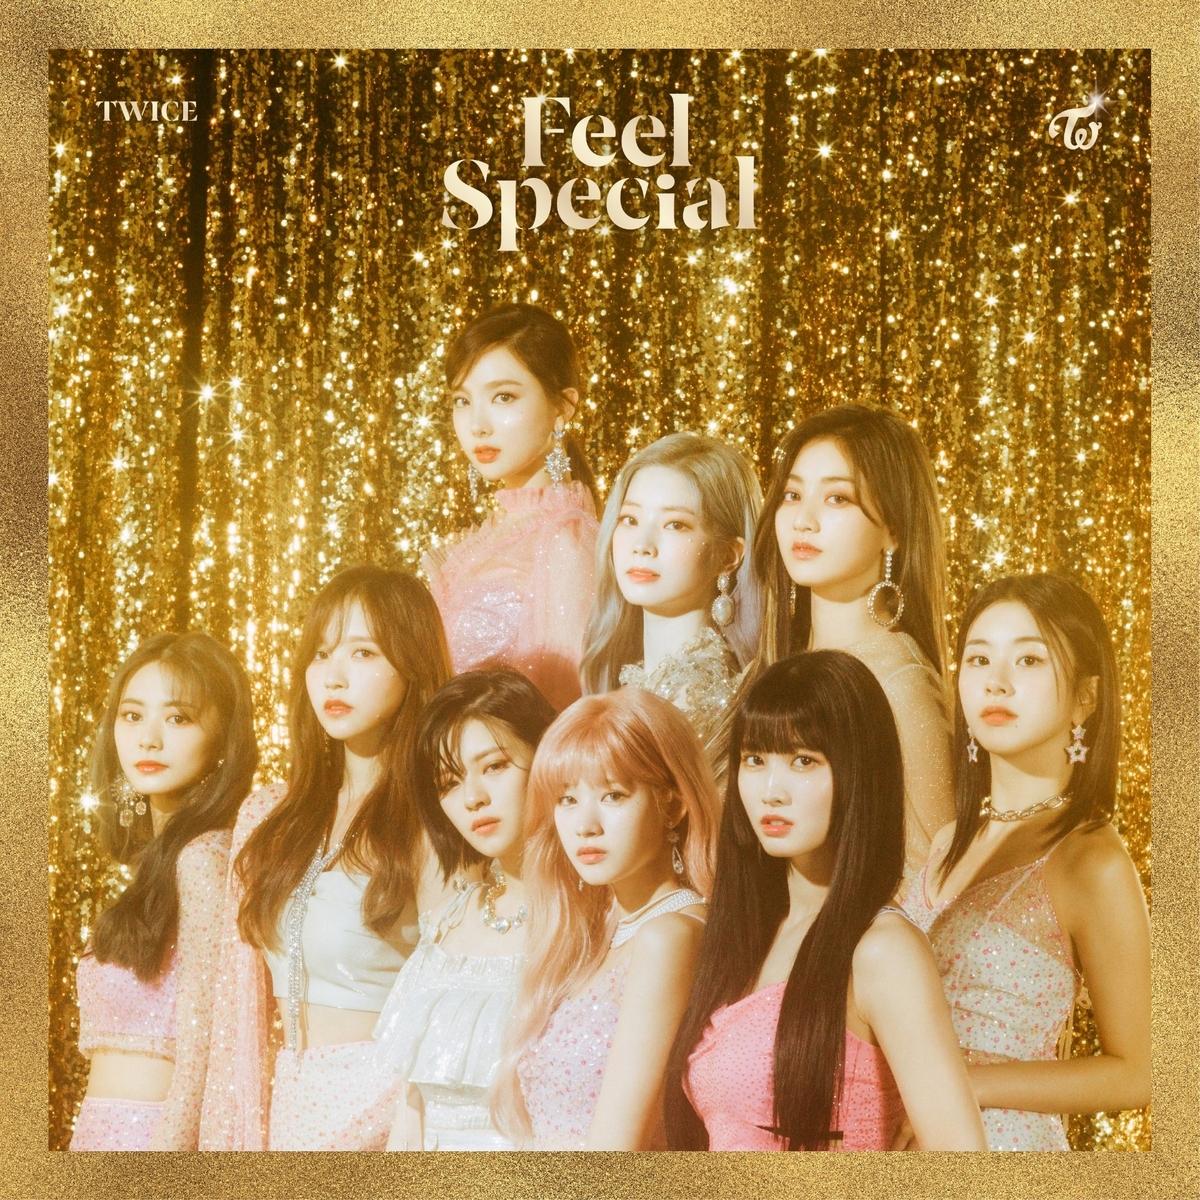 Feel Special 歌詞カナルビ Twice新曲フルver 韓国語曲を歌おう